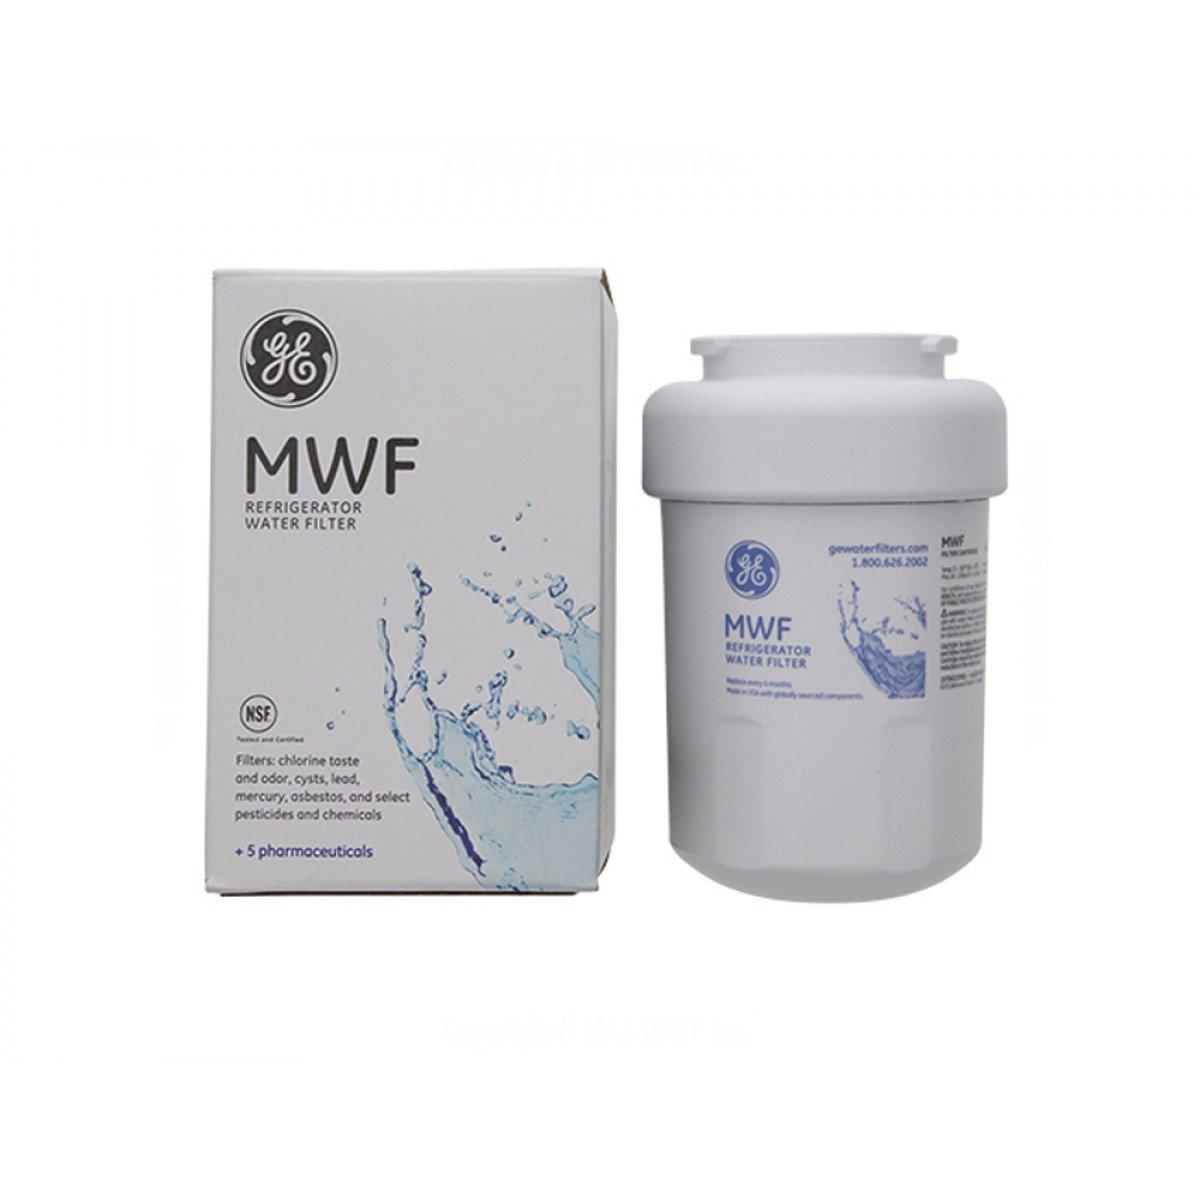 GE MWF SmartWater Refrigerator Water Filter